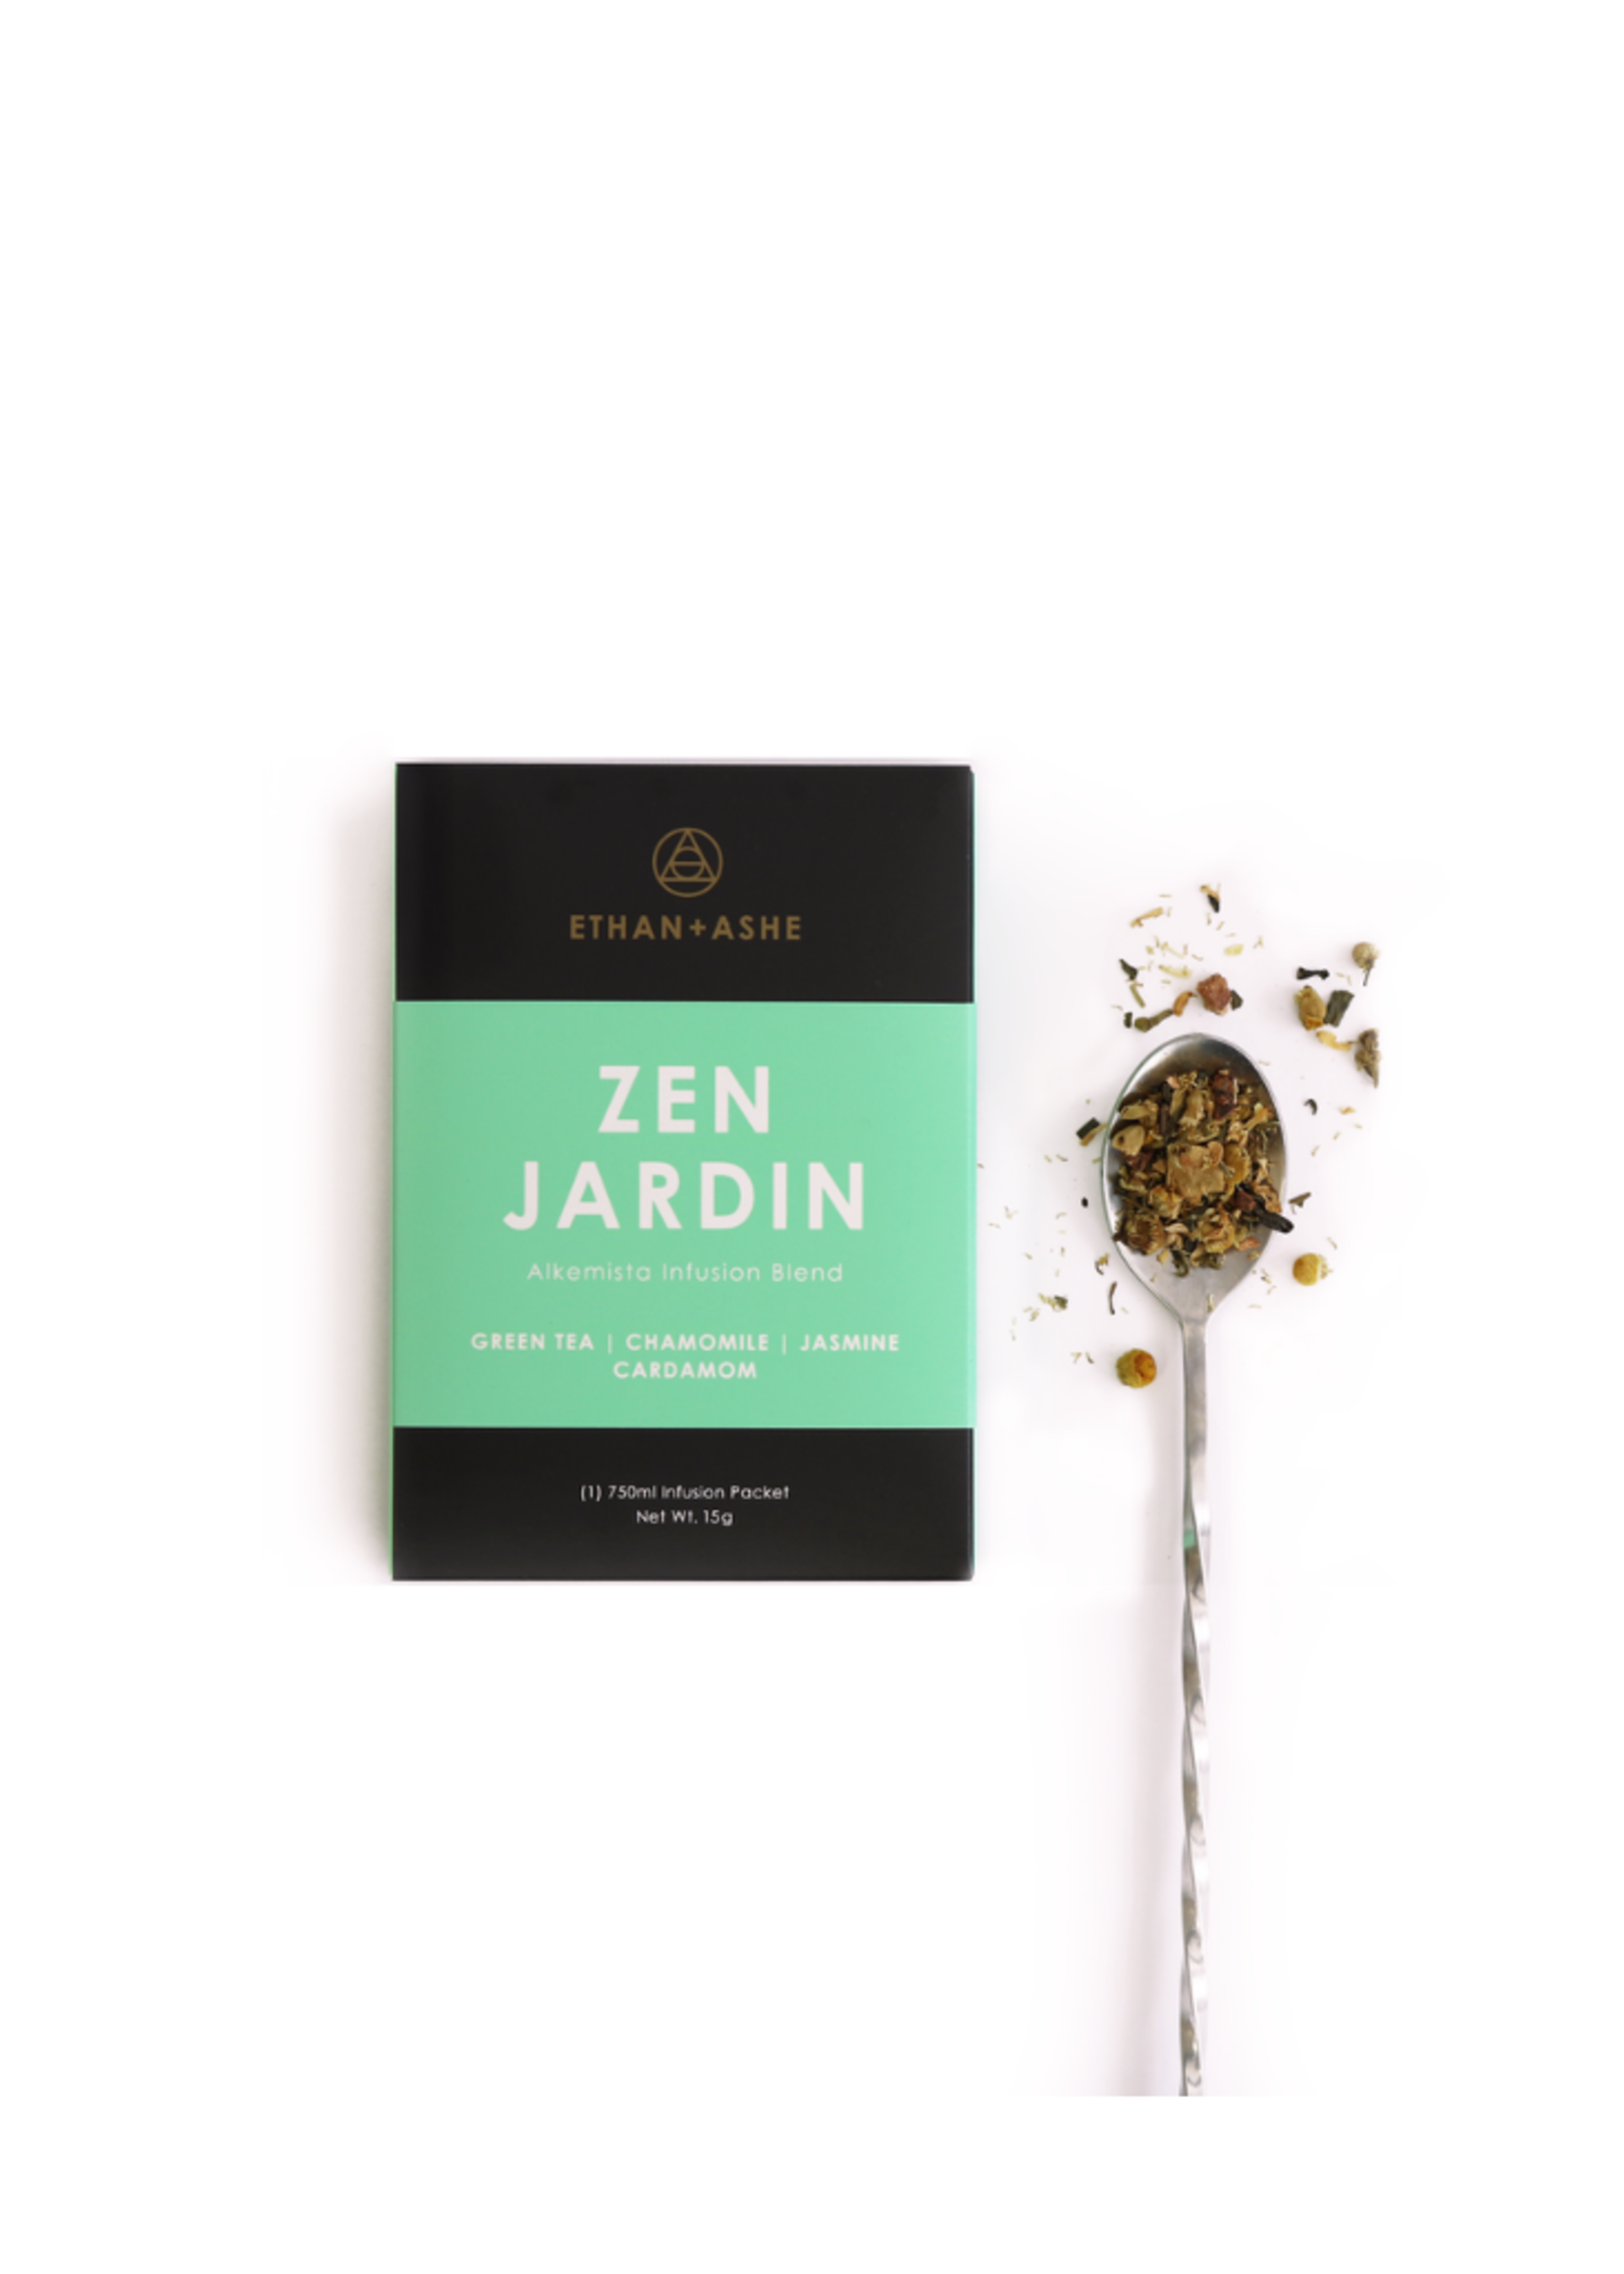 Ethan+Ashe Zen Jardin Infusion Blend